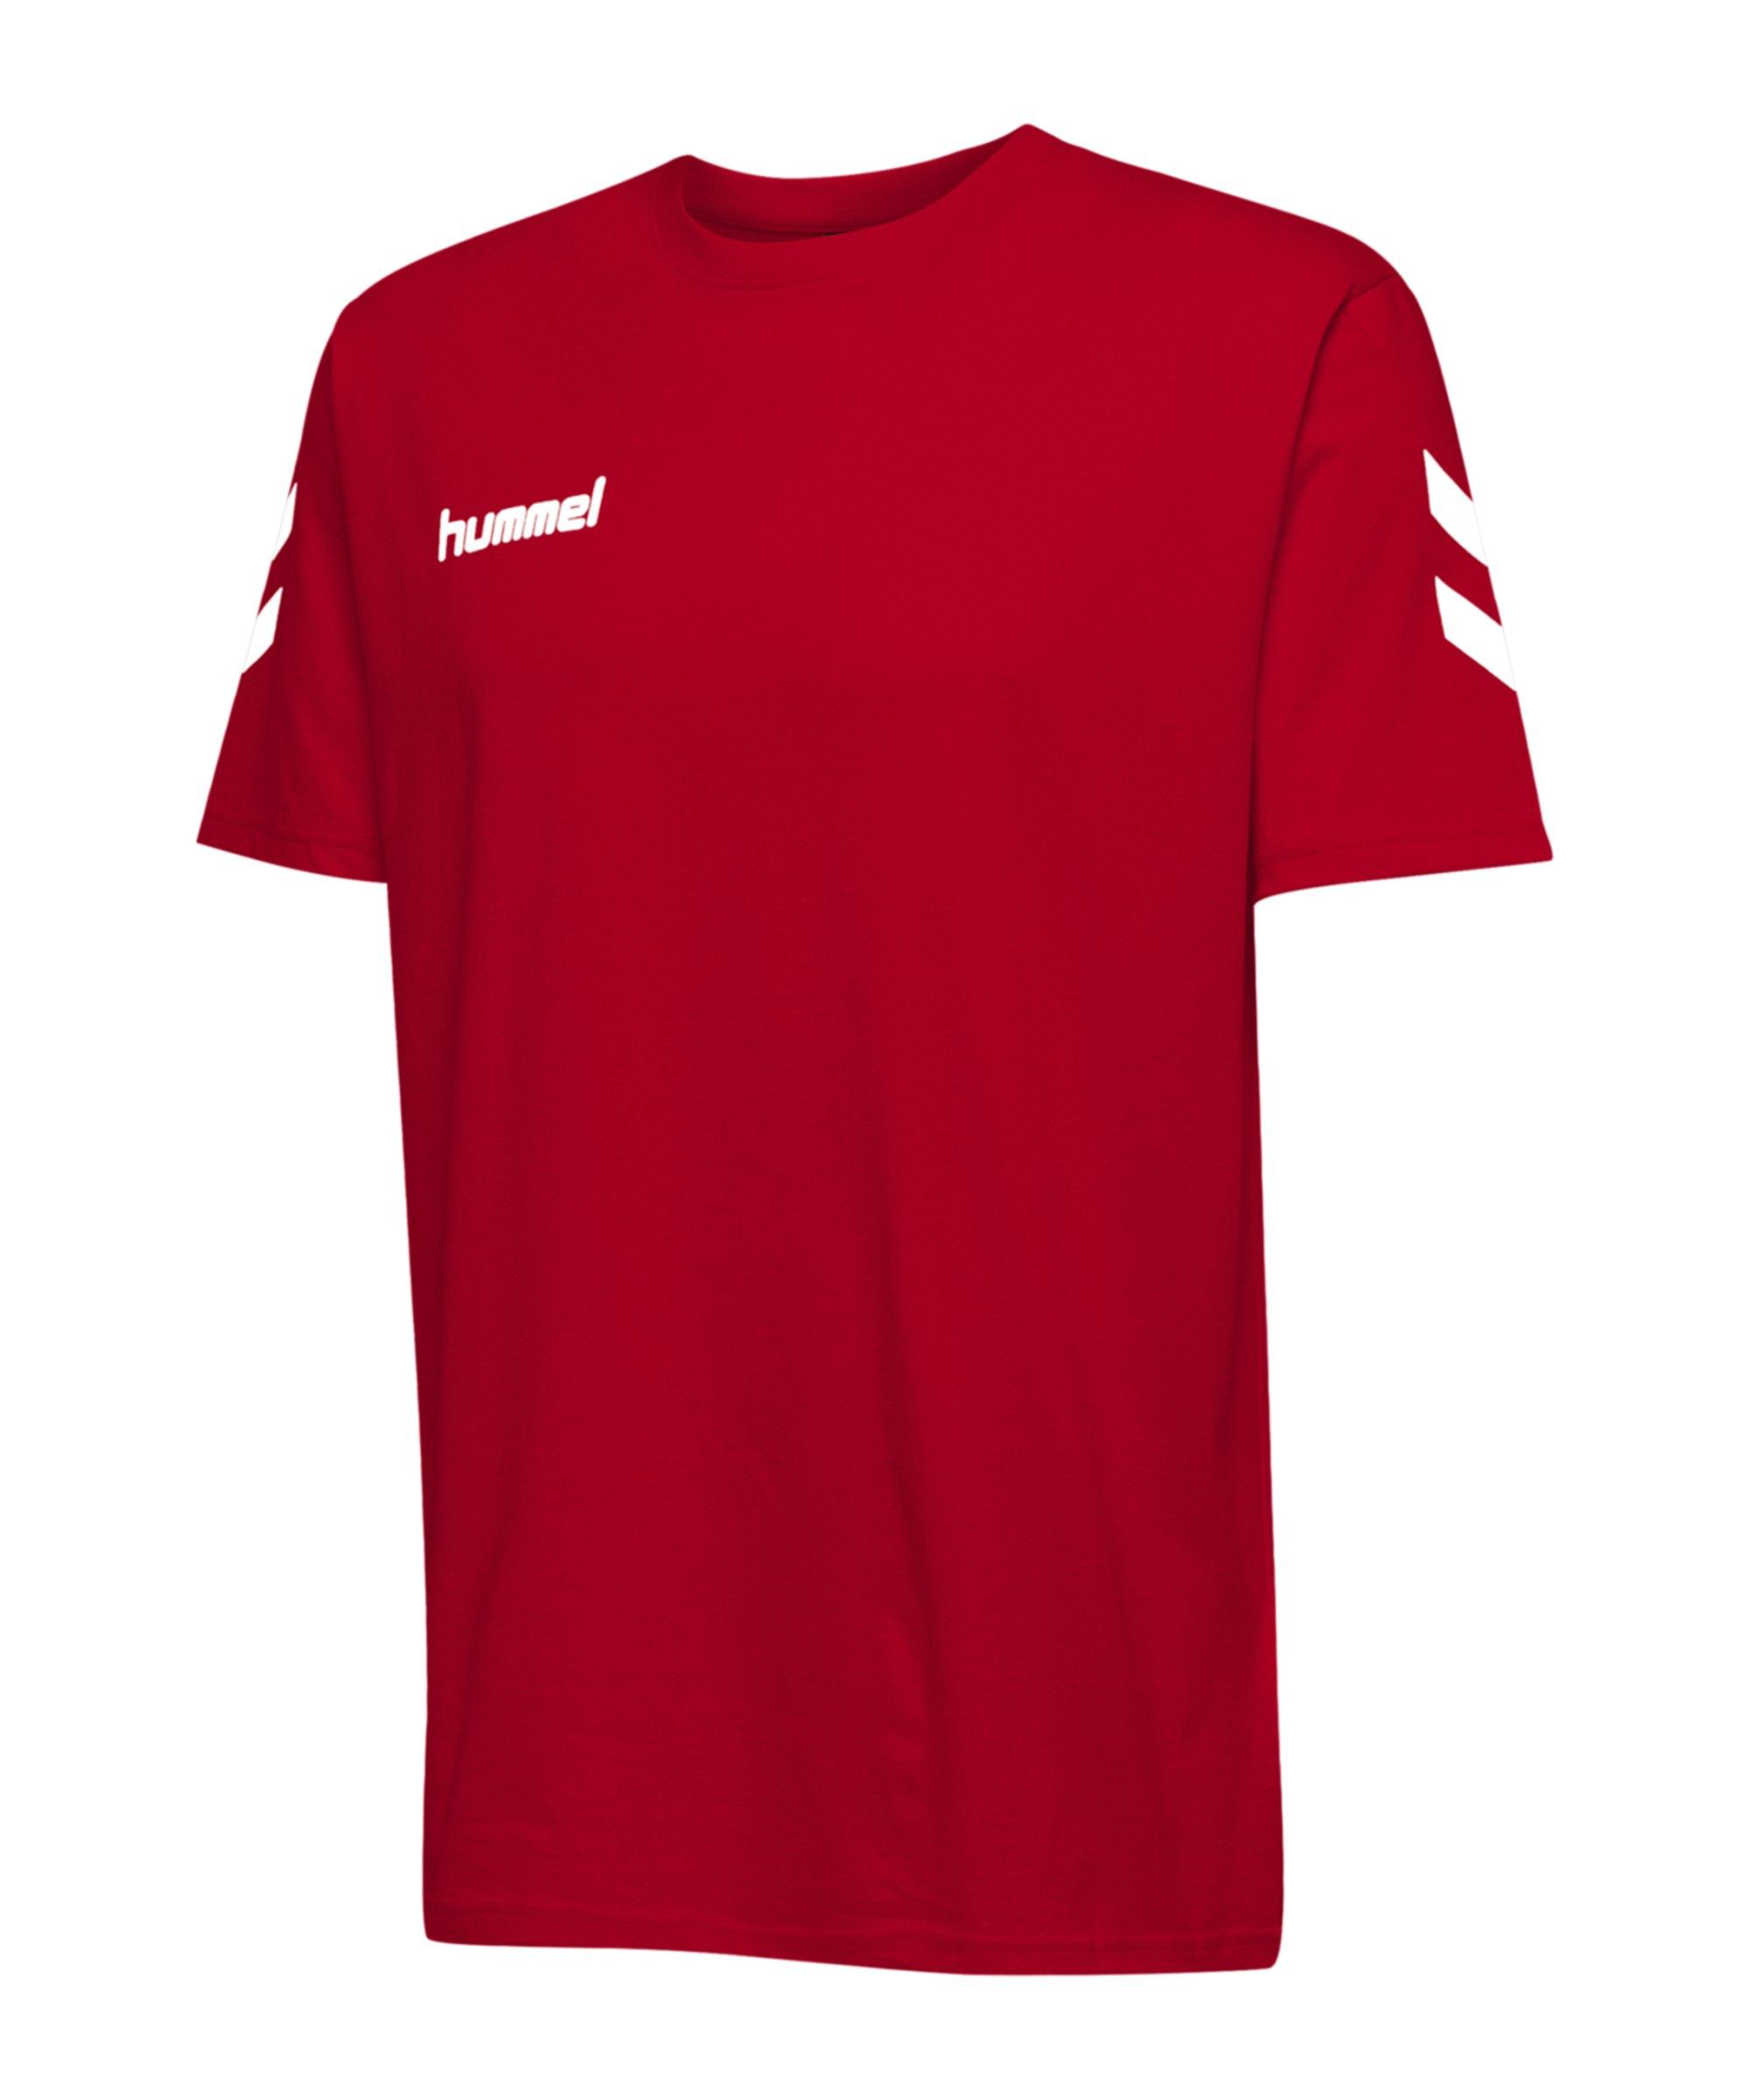 Hummel Cotton T-Shirt Rot F3062 - Rot